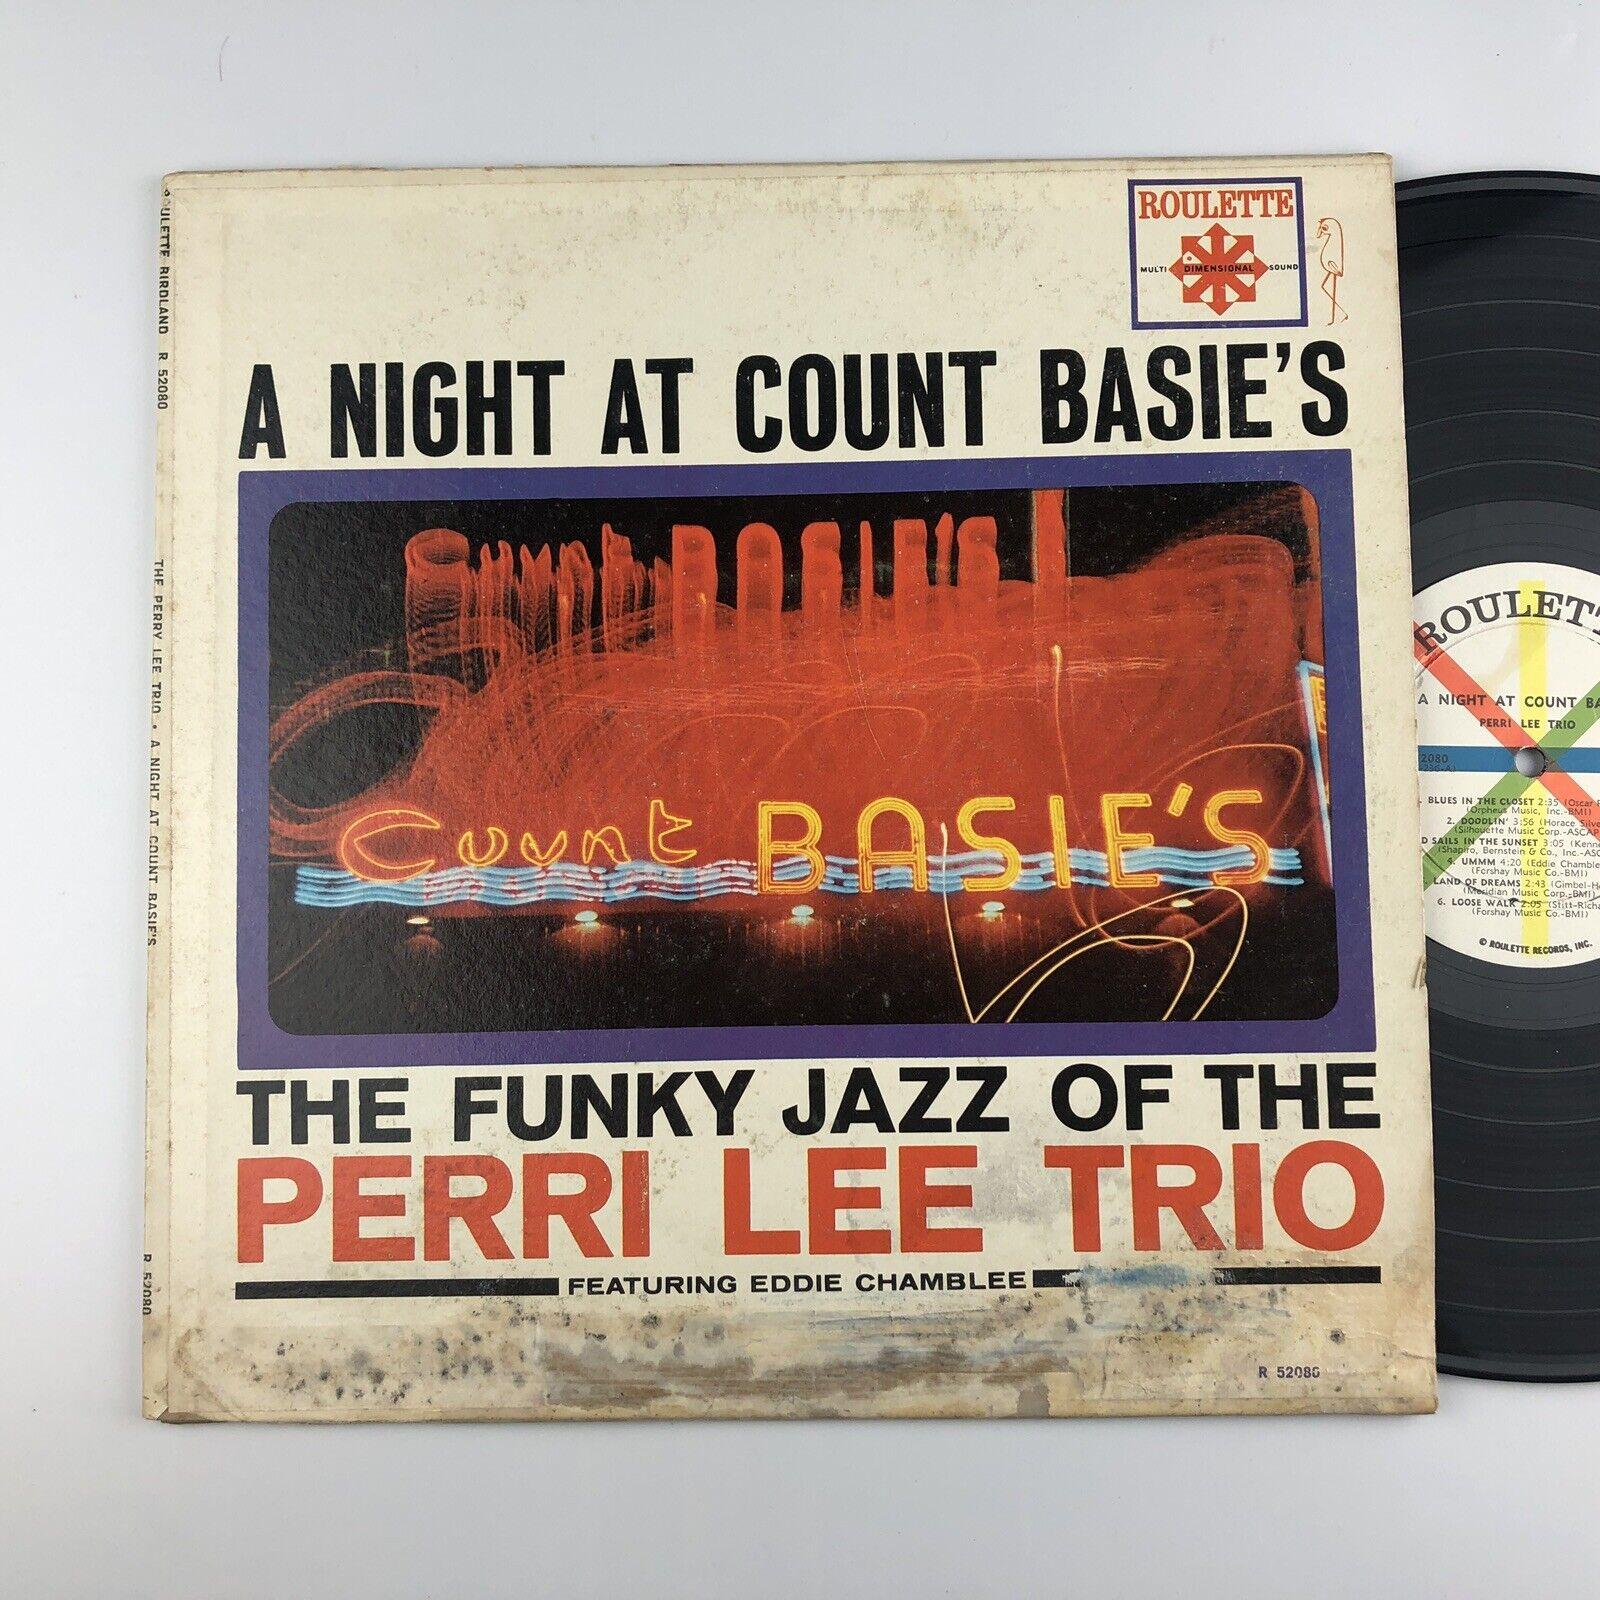 Image 1 - PERRI LEE TRIO A Night At Count Basie's ROULETTE LP RARE mono 52080 VINYL